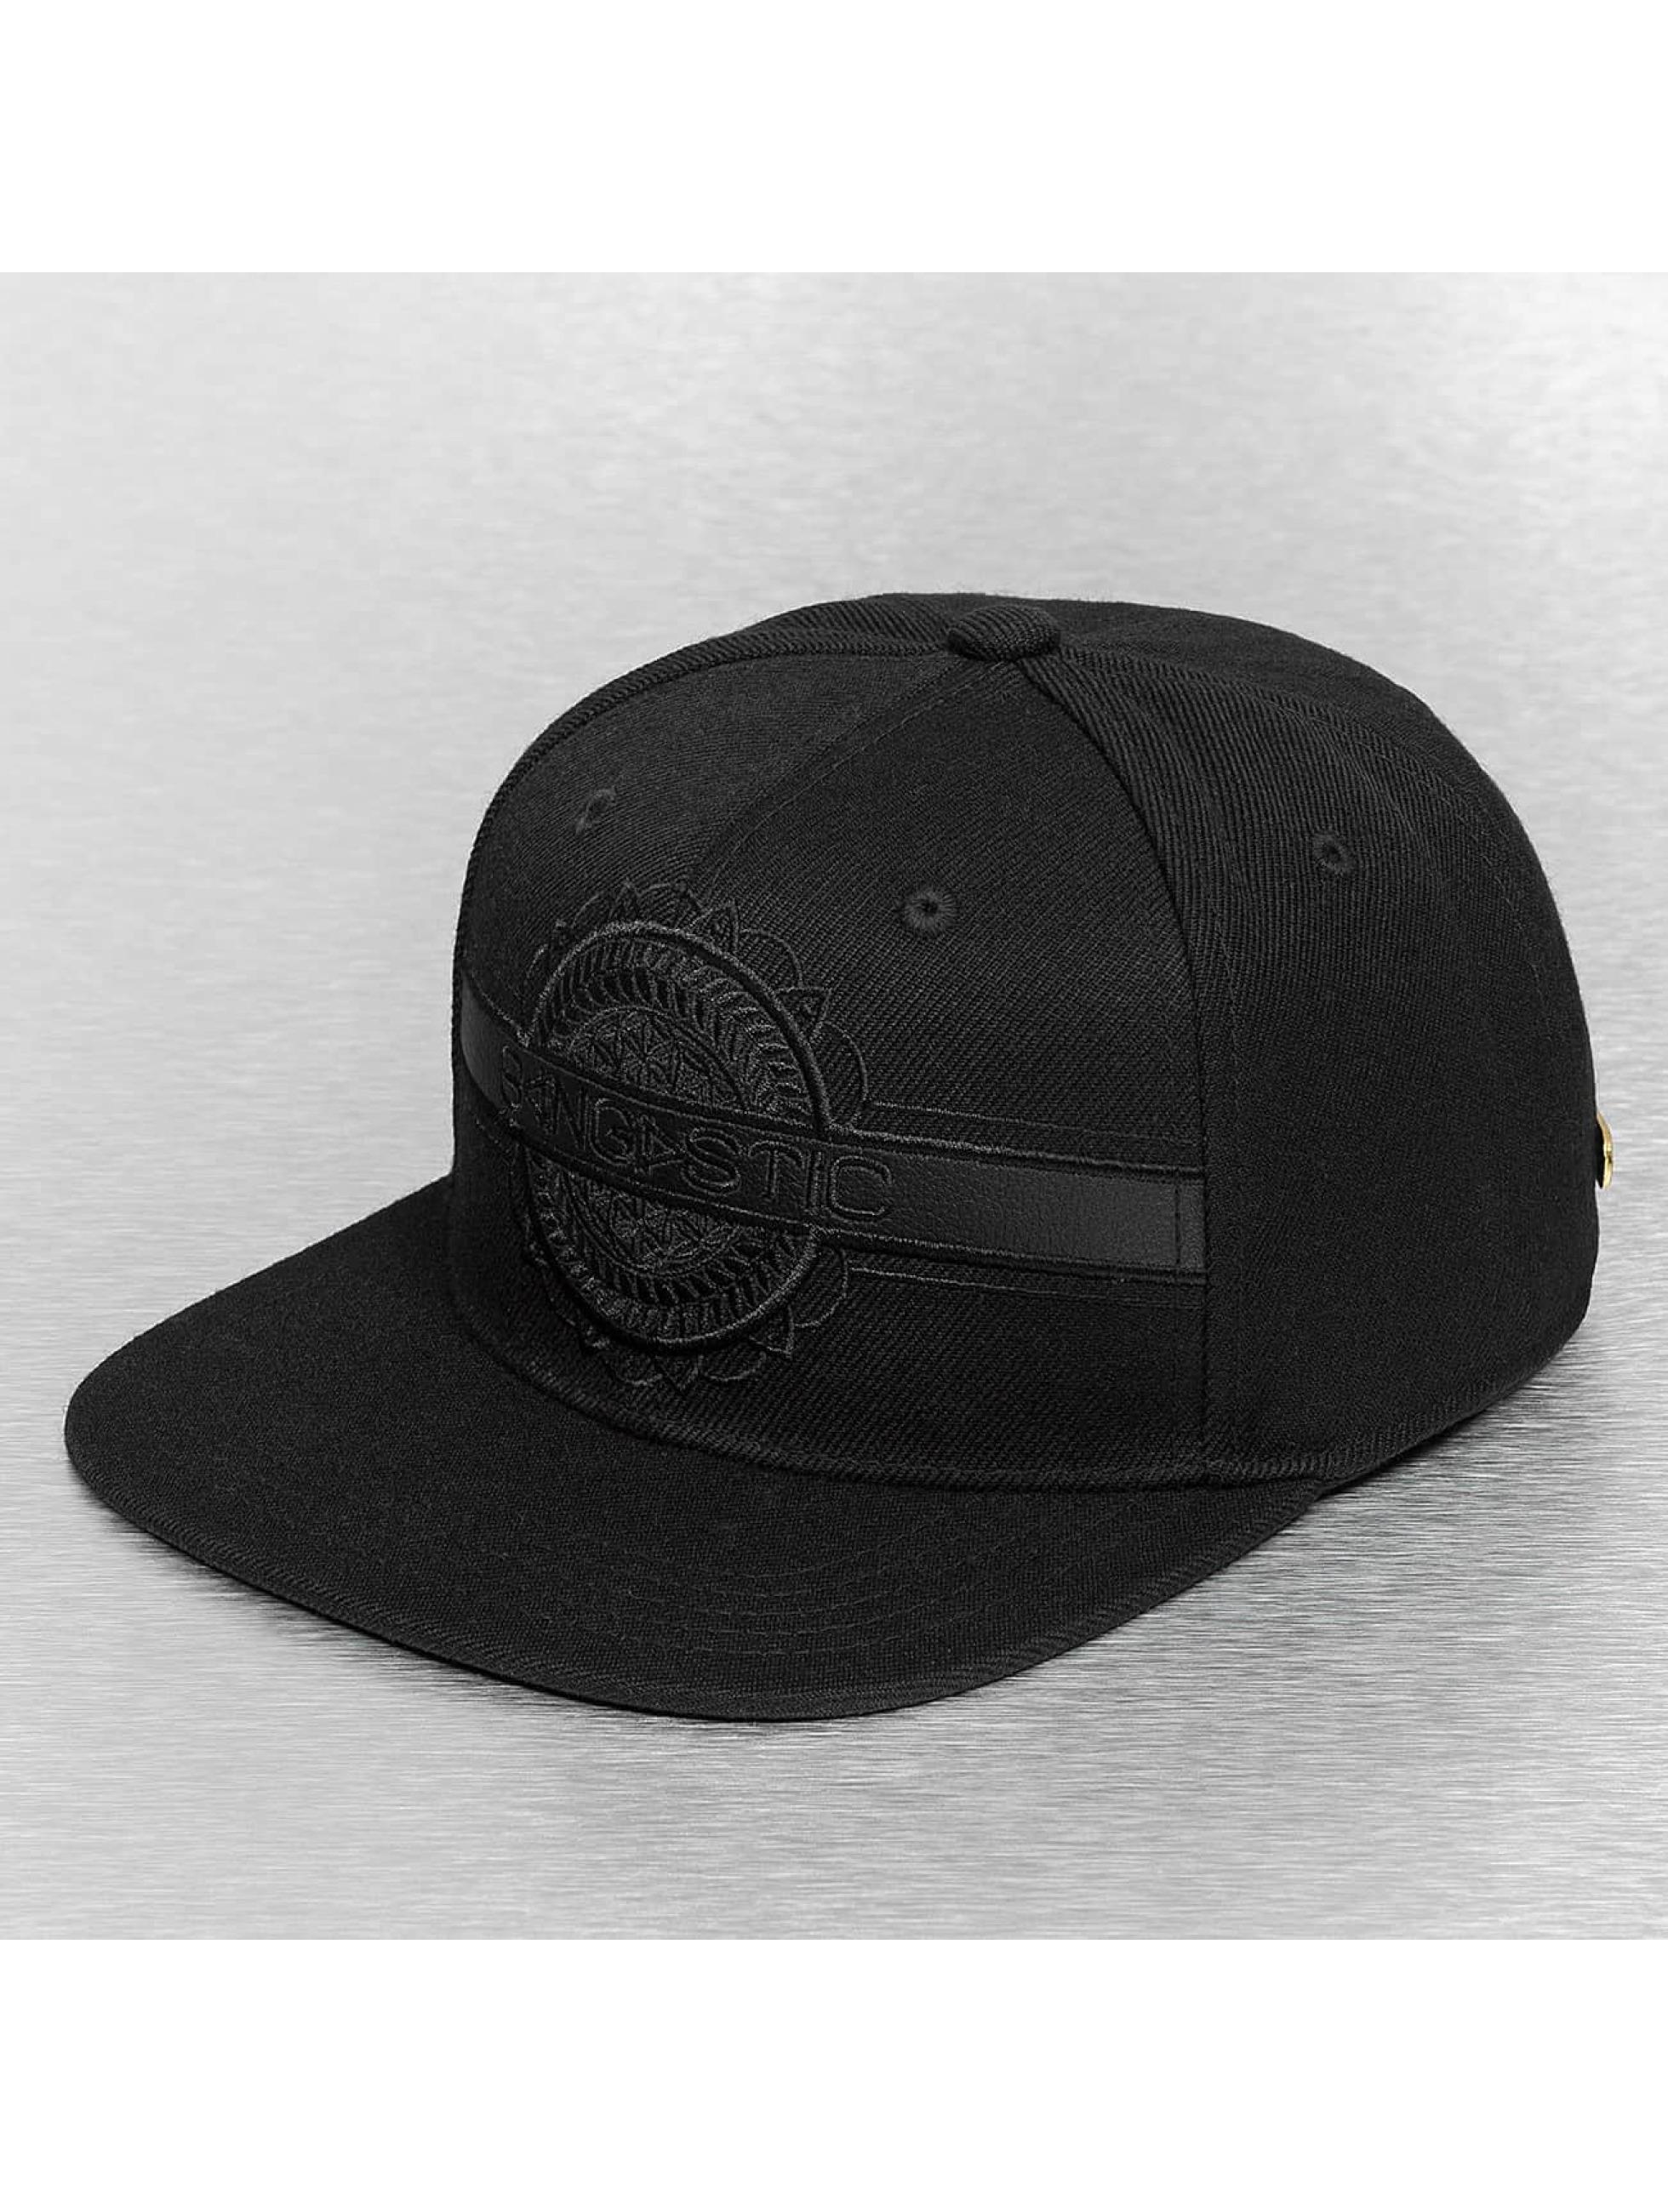 Bangastic Snapback Cap Black On Black schwarz